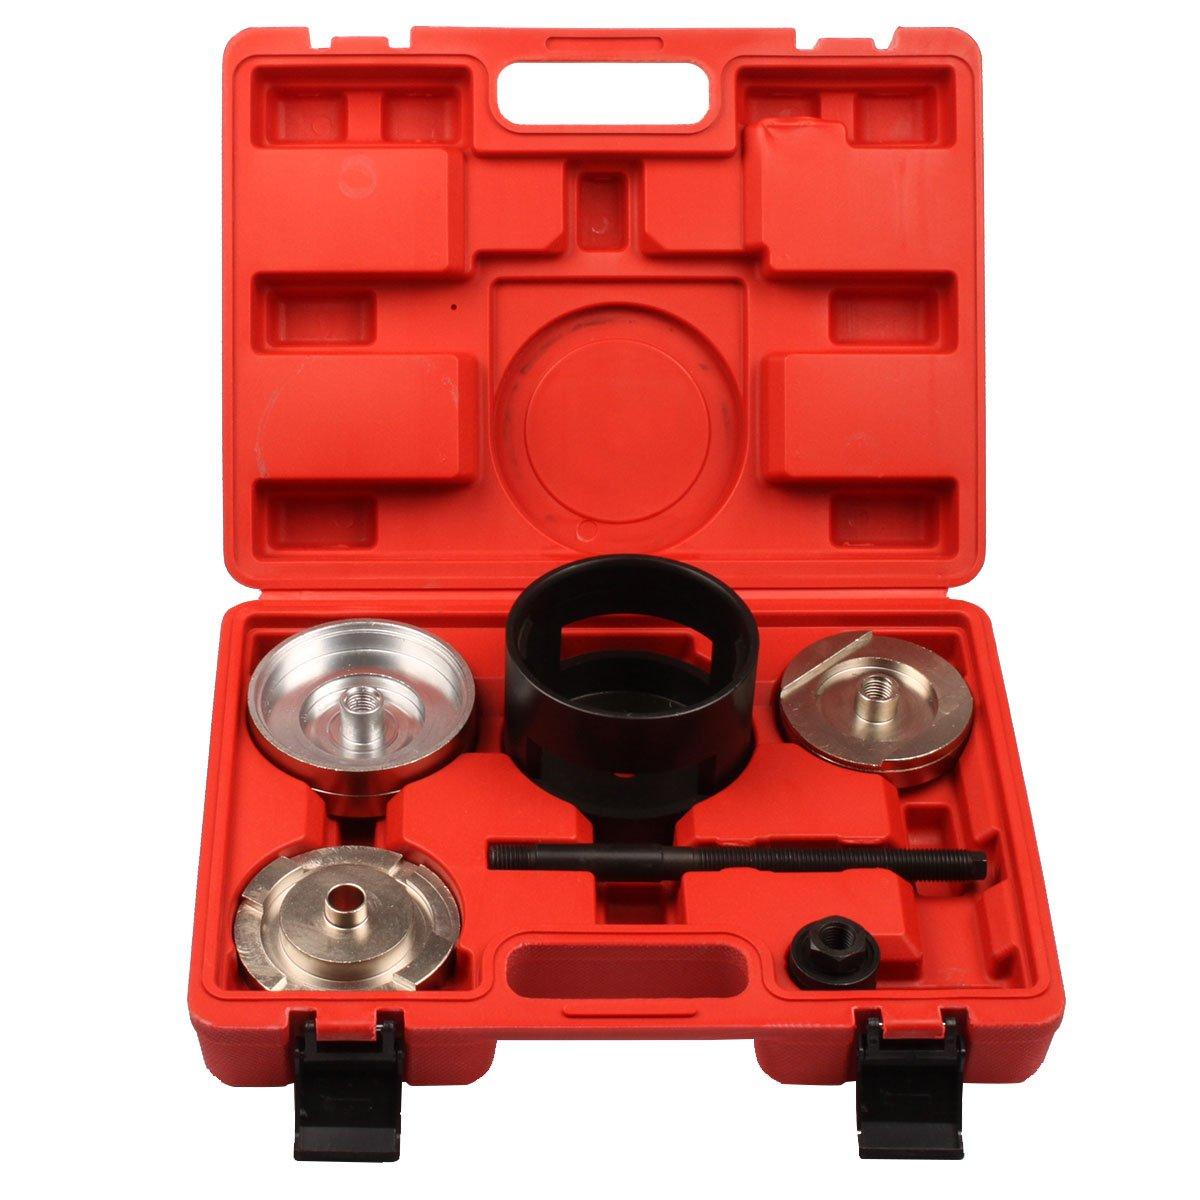 Qbace Rear Axle Subframe Bush Installation Tool Kit for BMW X5